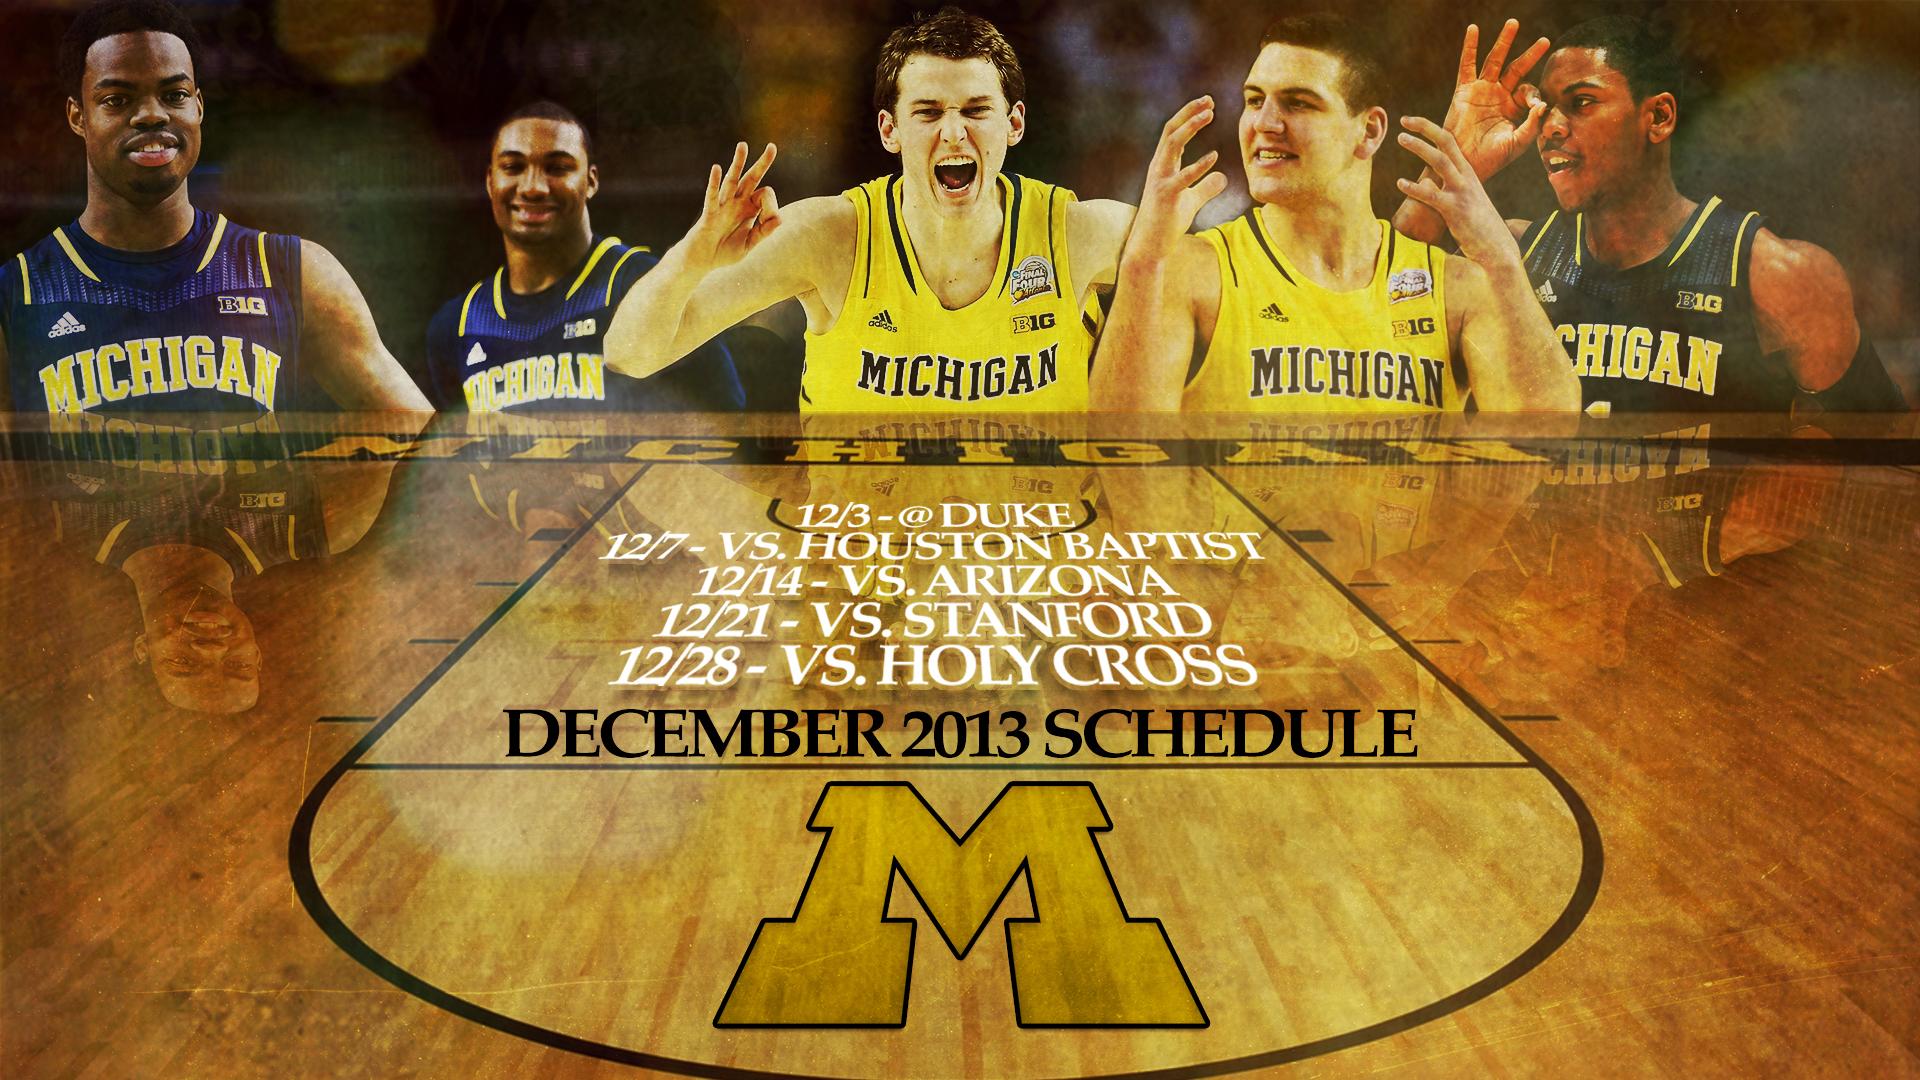 Wallpaper Season December Basketball Schedule Mgoblog